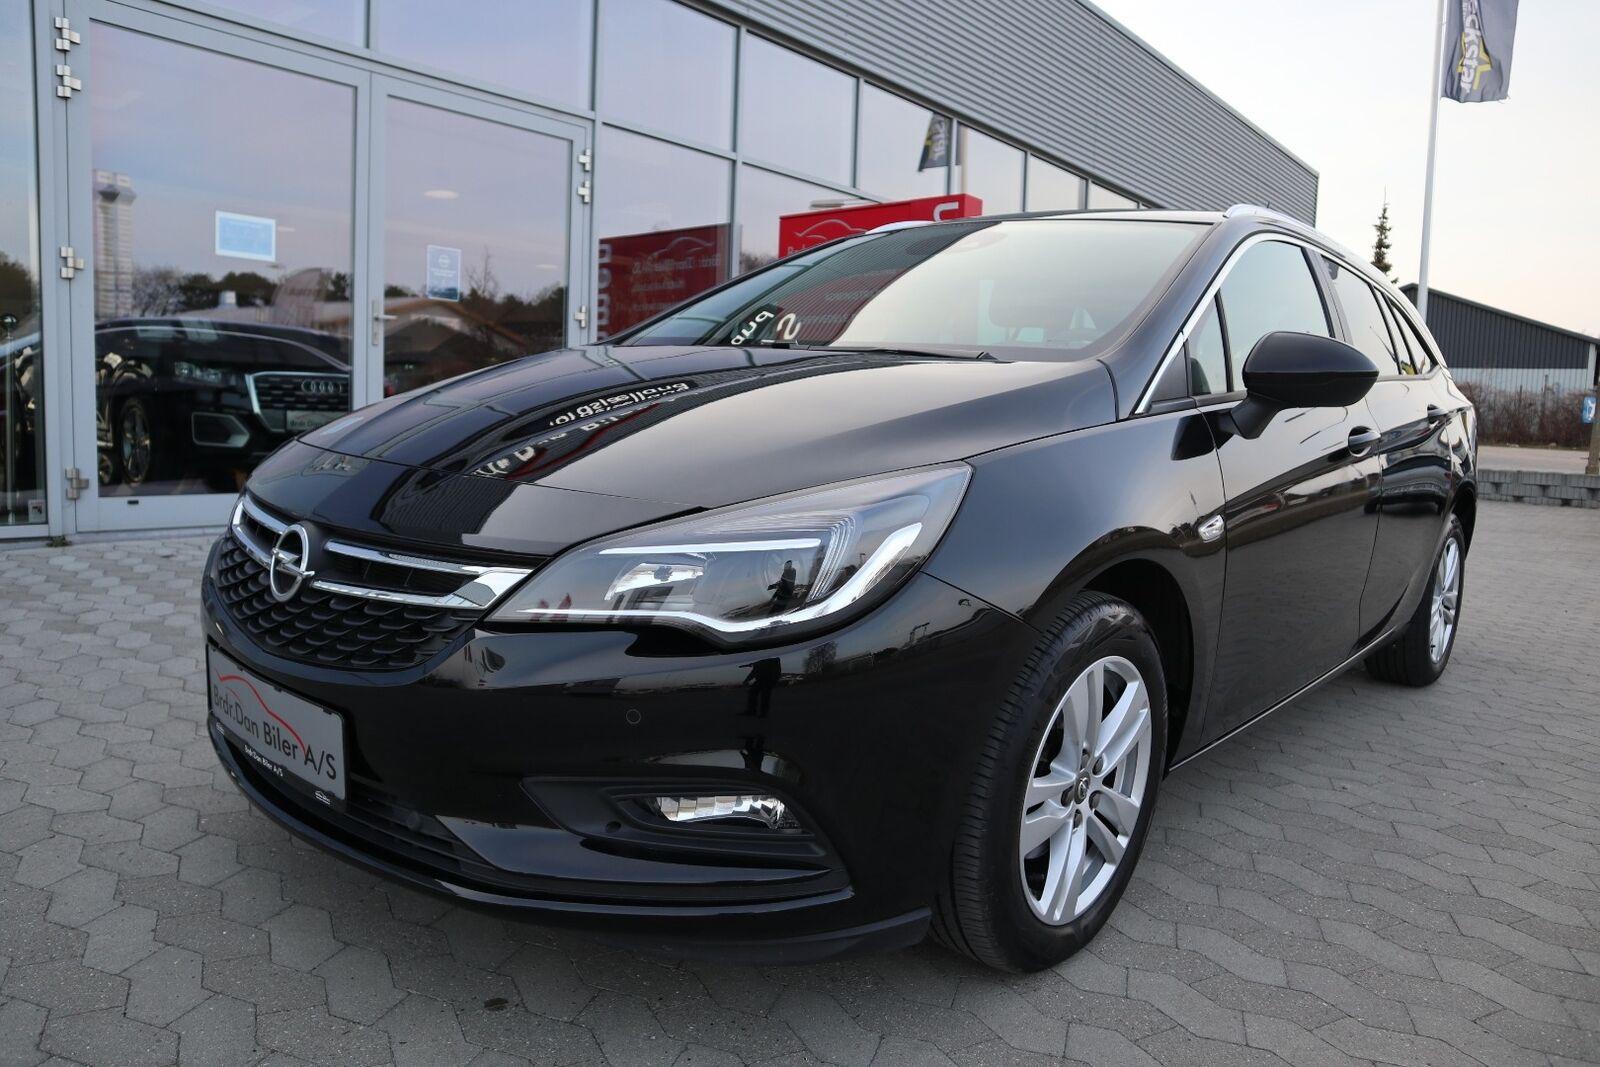 Opel Astra 1,4 T 150 Impress Sports Tourer aut.